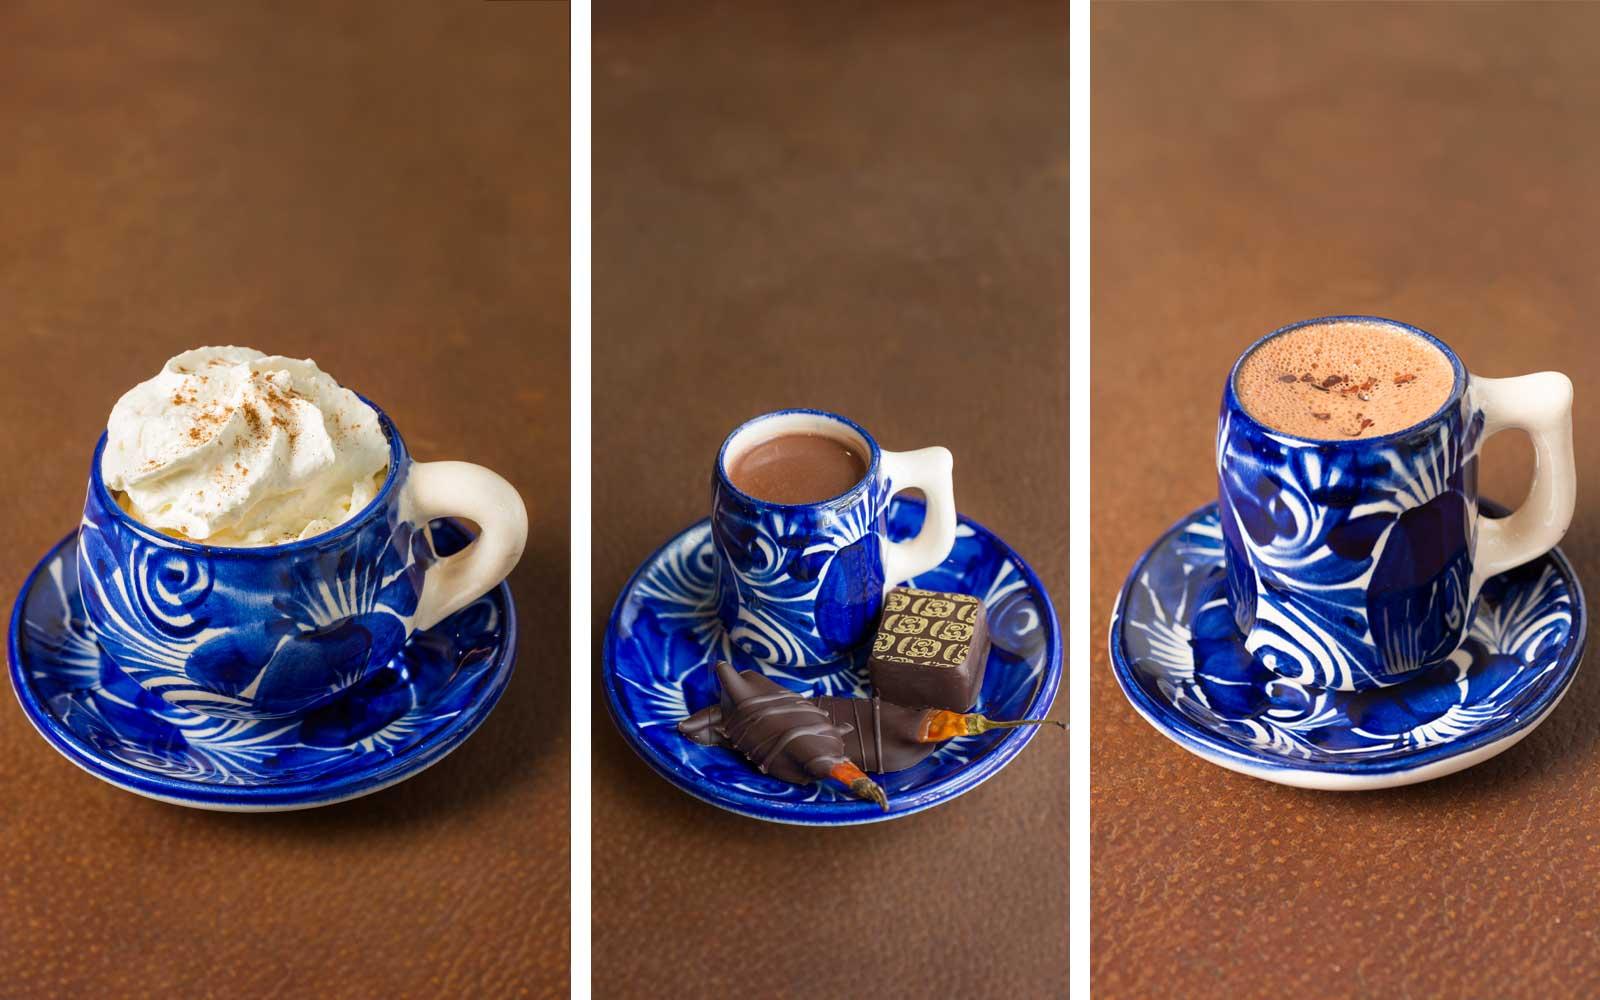 Best Hot Chocolate - Kakawa Chocolate House, Santa Fe